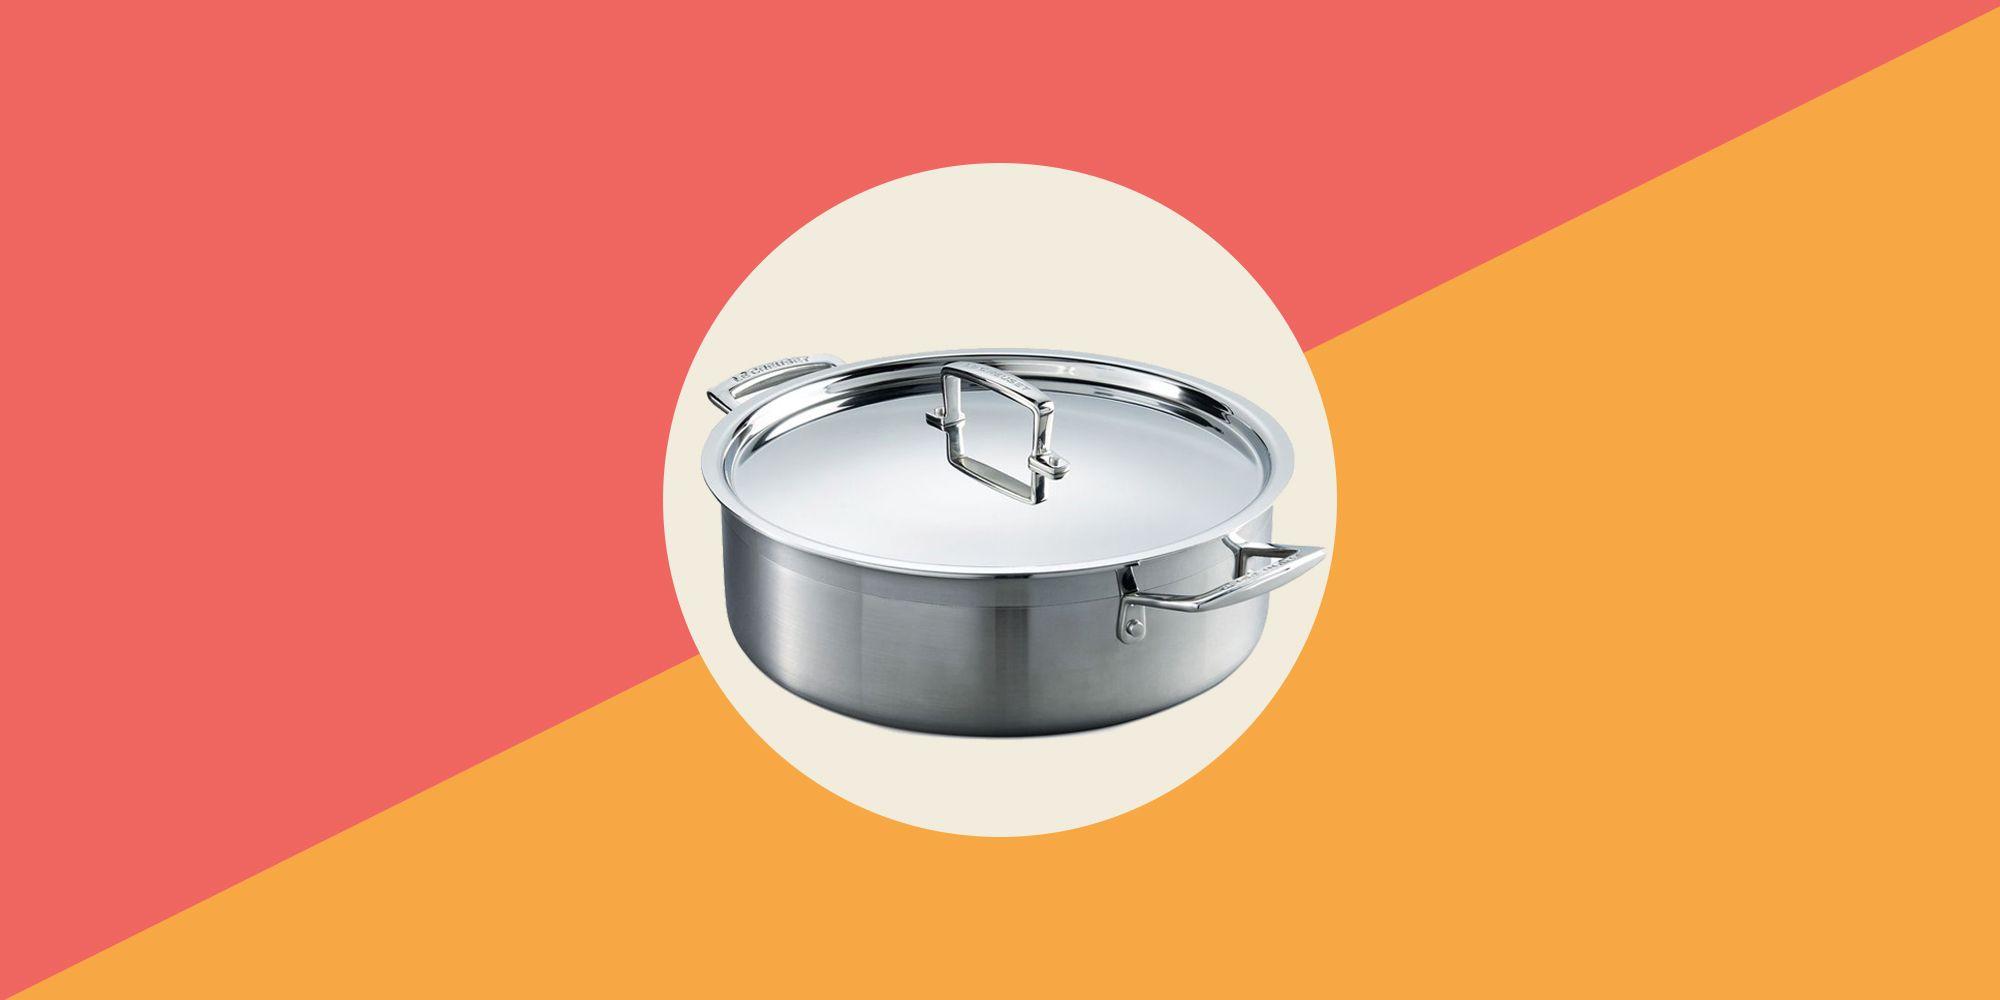 The sleek Le Creuset range to transform your kitchen